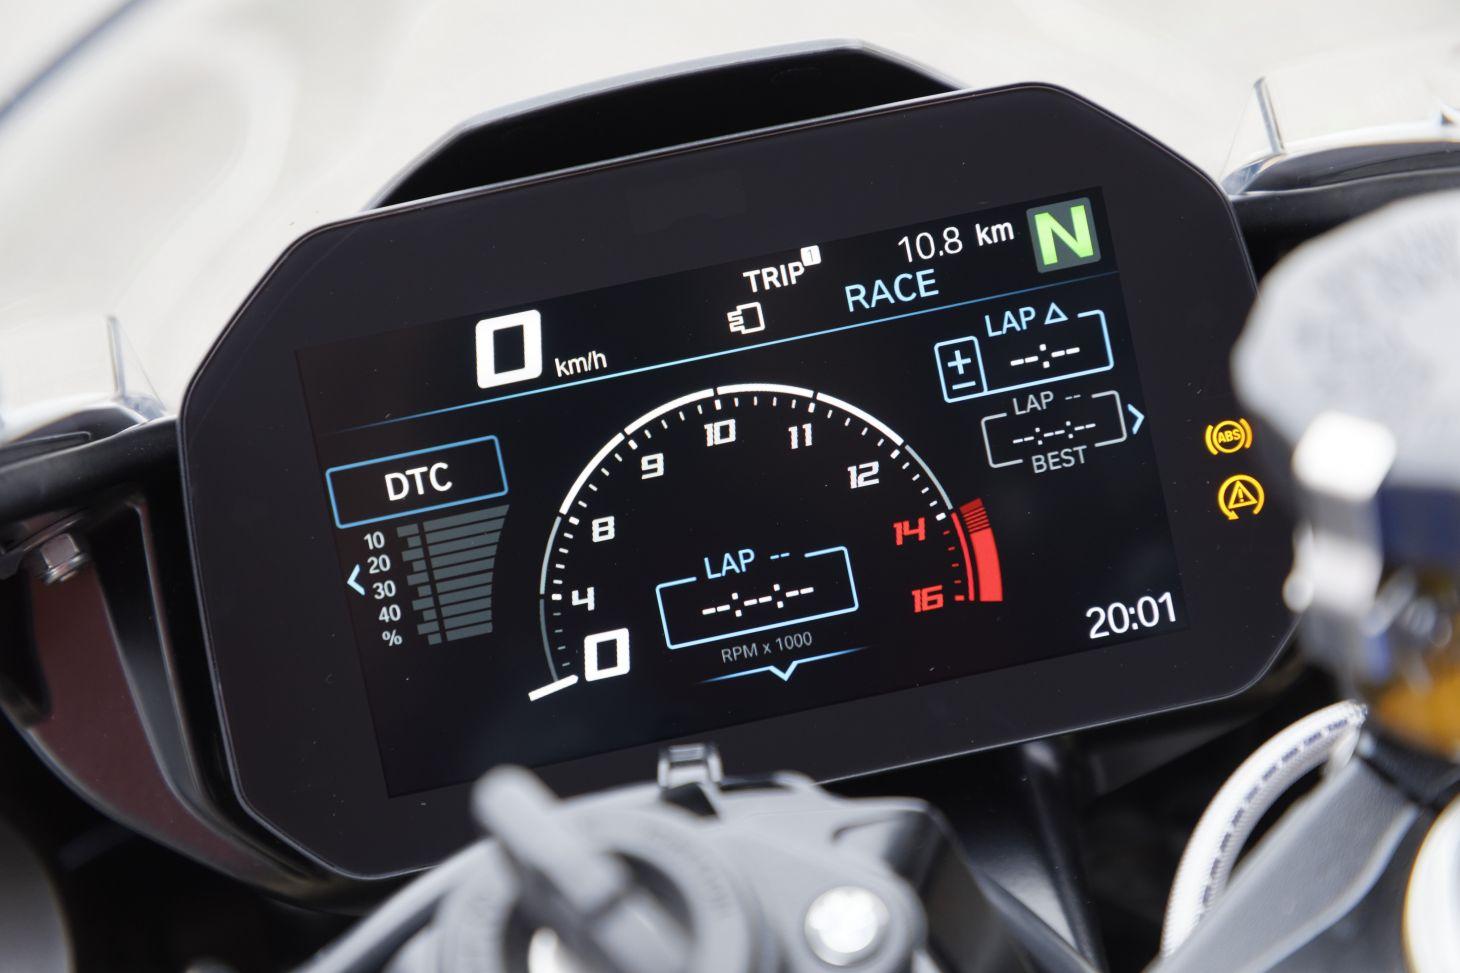 Painel da BMW S1000 RR 2020